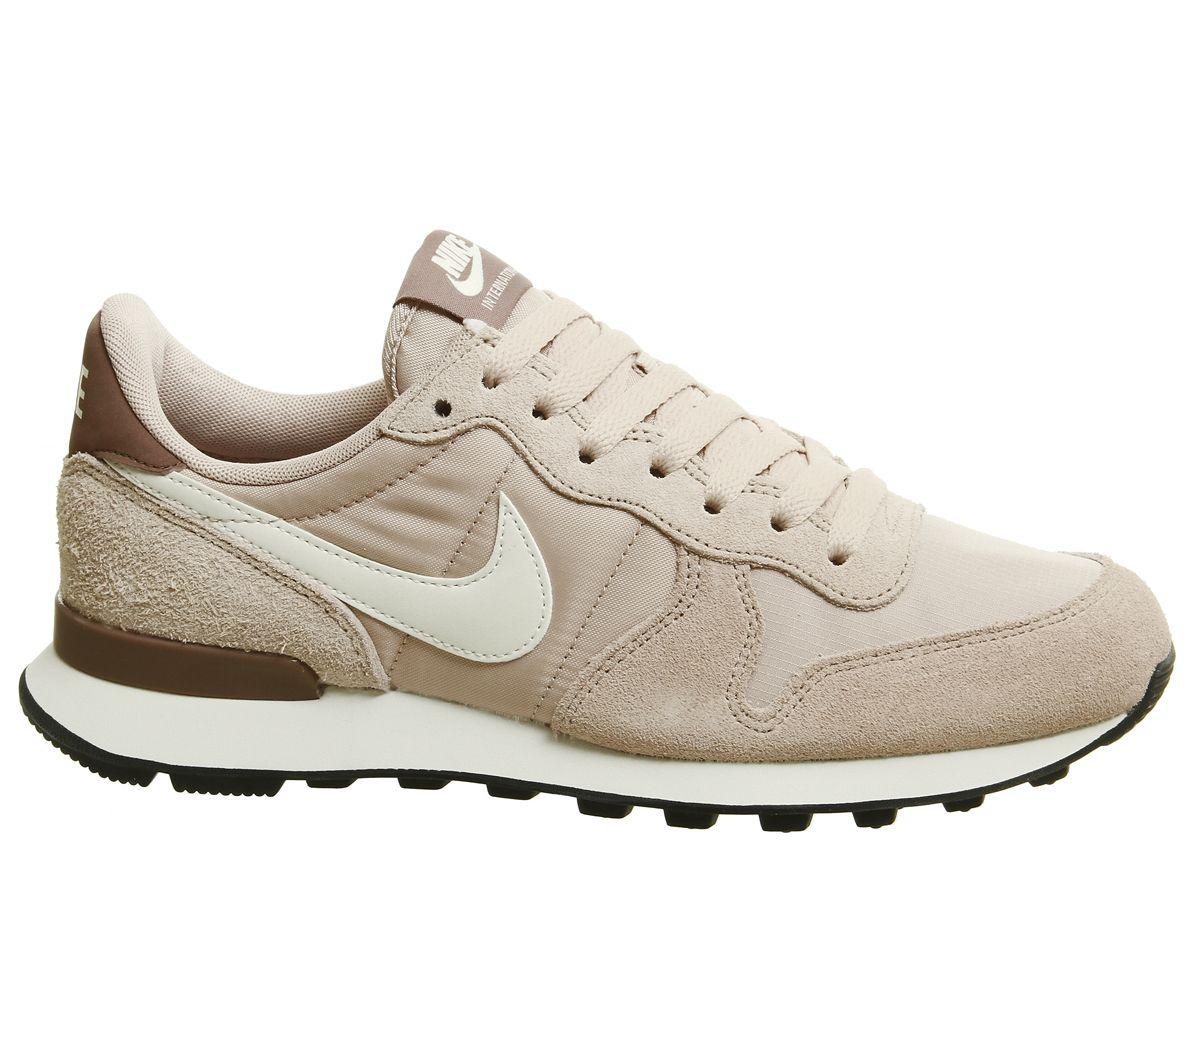 Nike Internationalist Trainers Beige Nike Shoes Nike Internationalist Nike Shoes Outfits